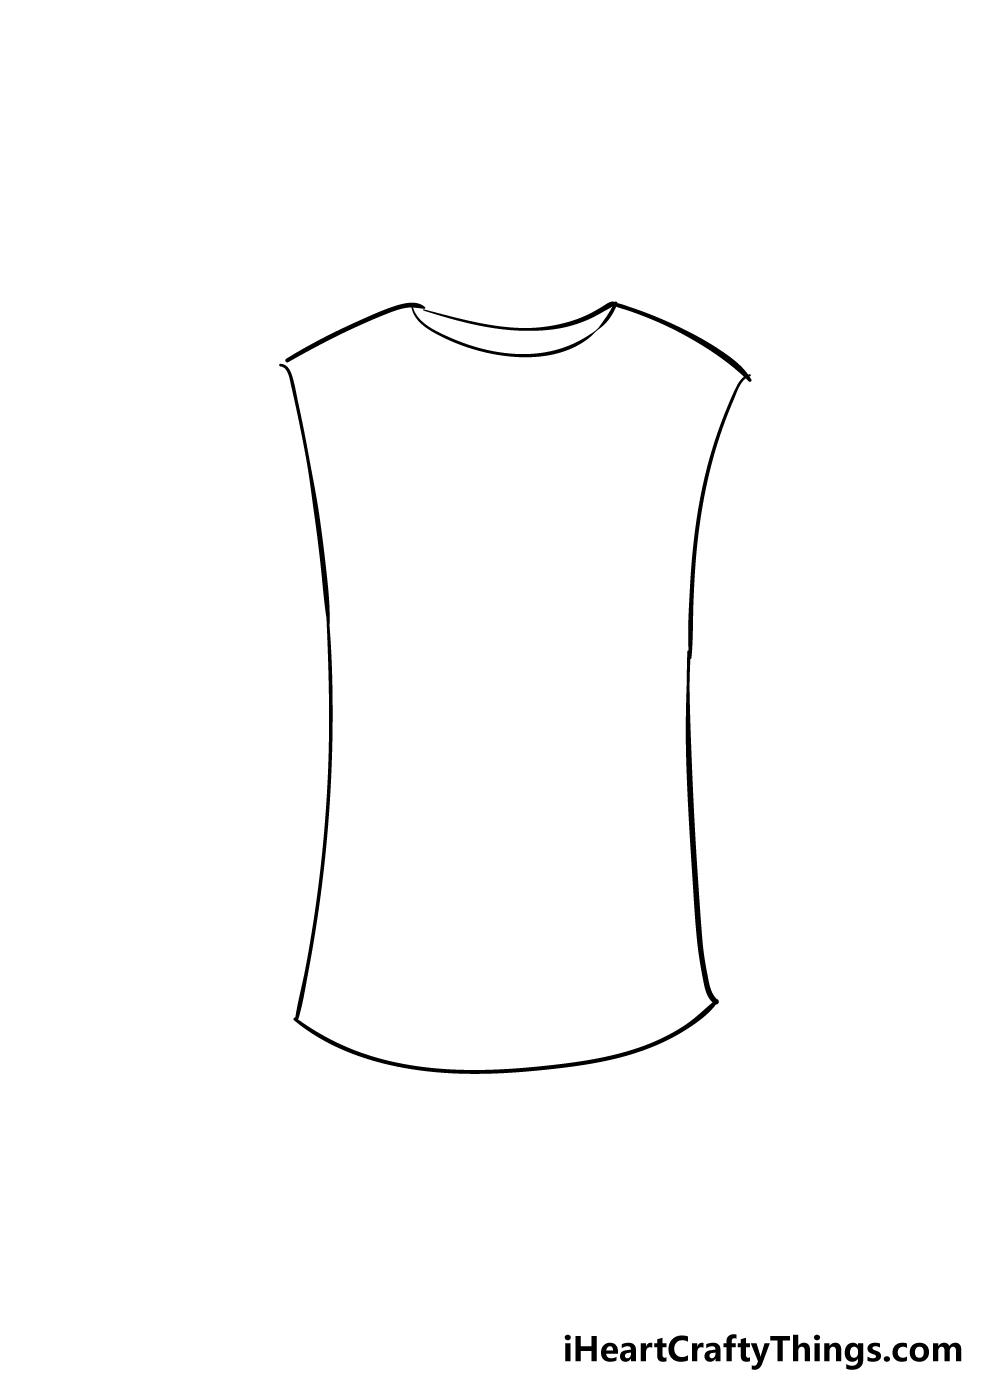 shirt drawing step 3